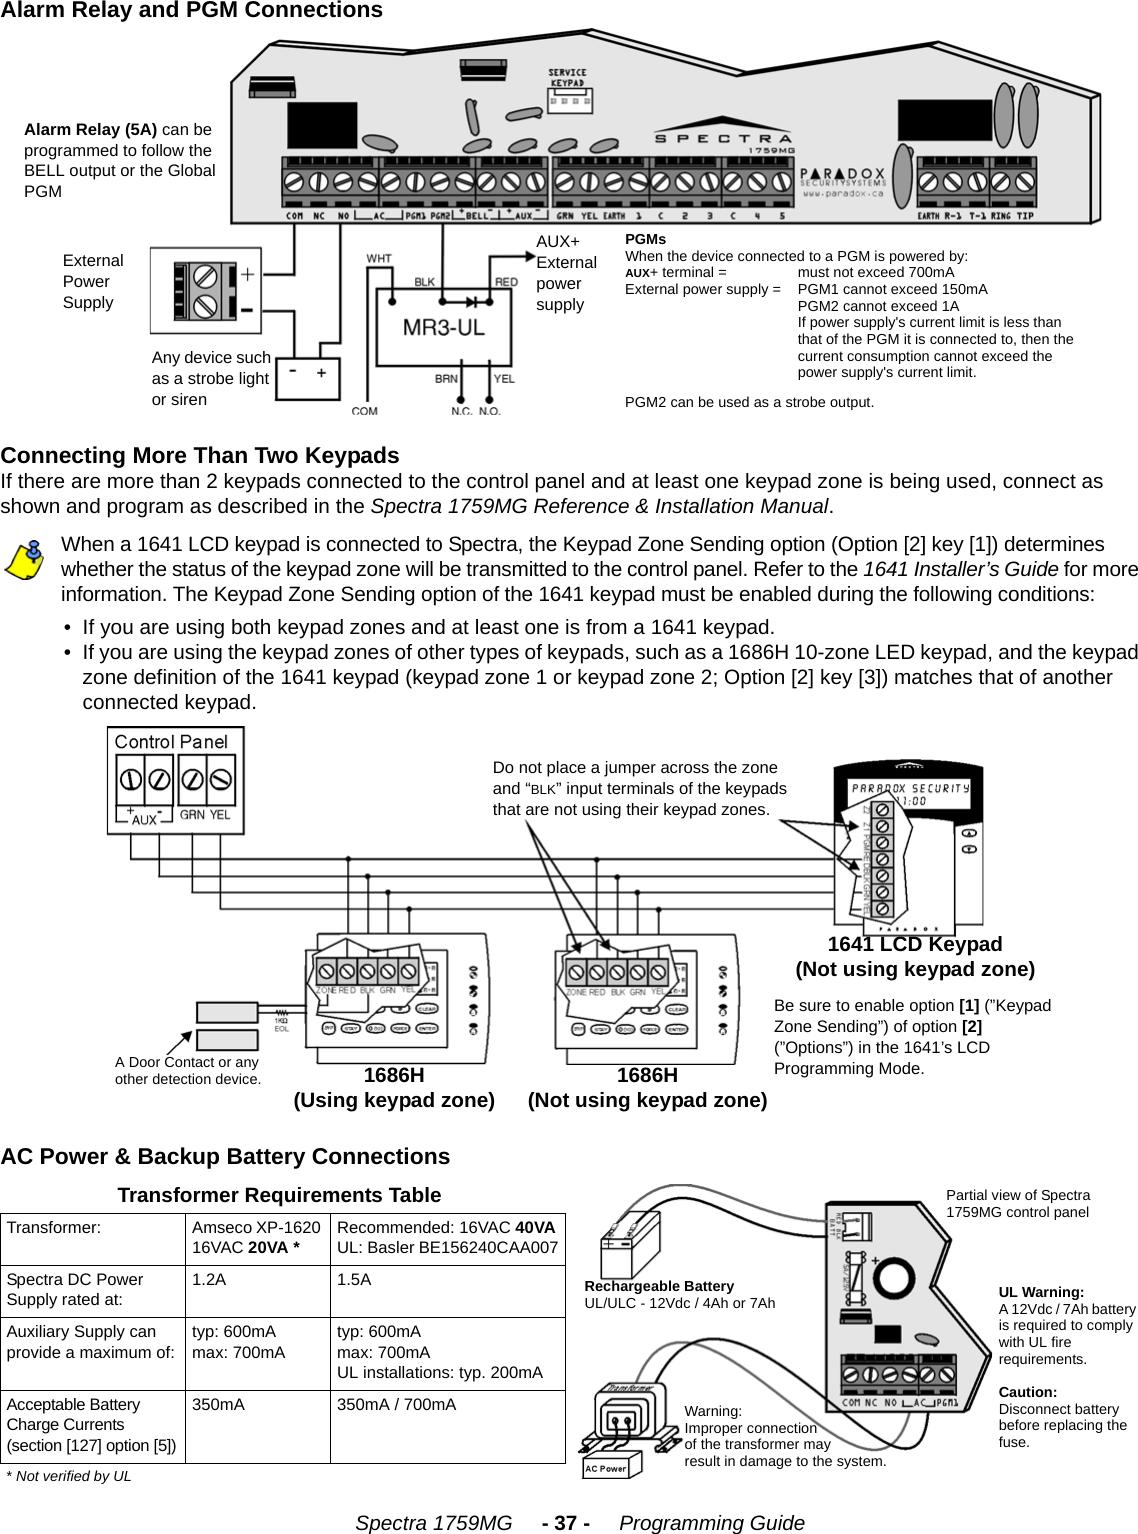 paradox spectra sp6000 user manual